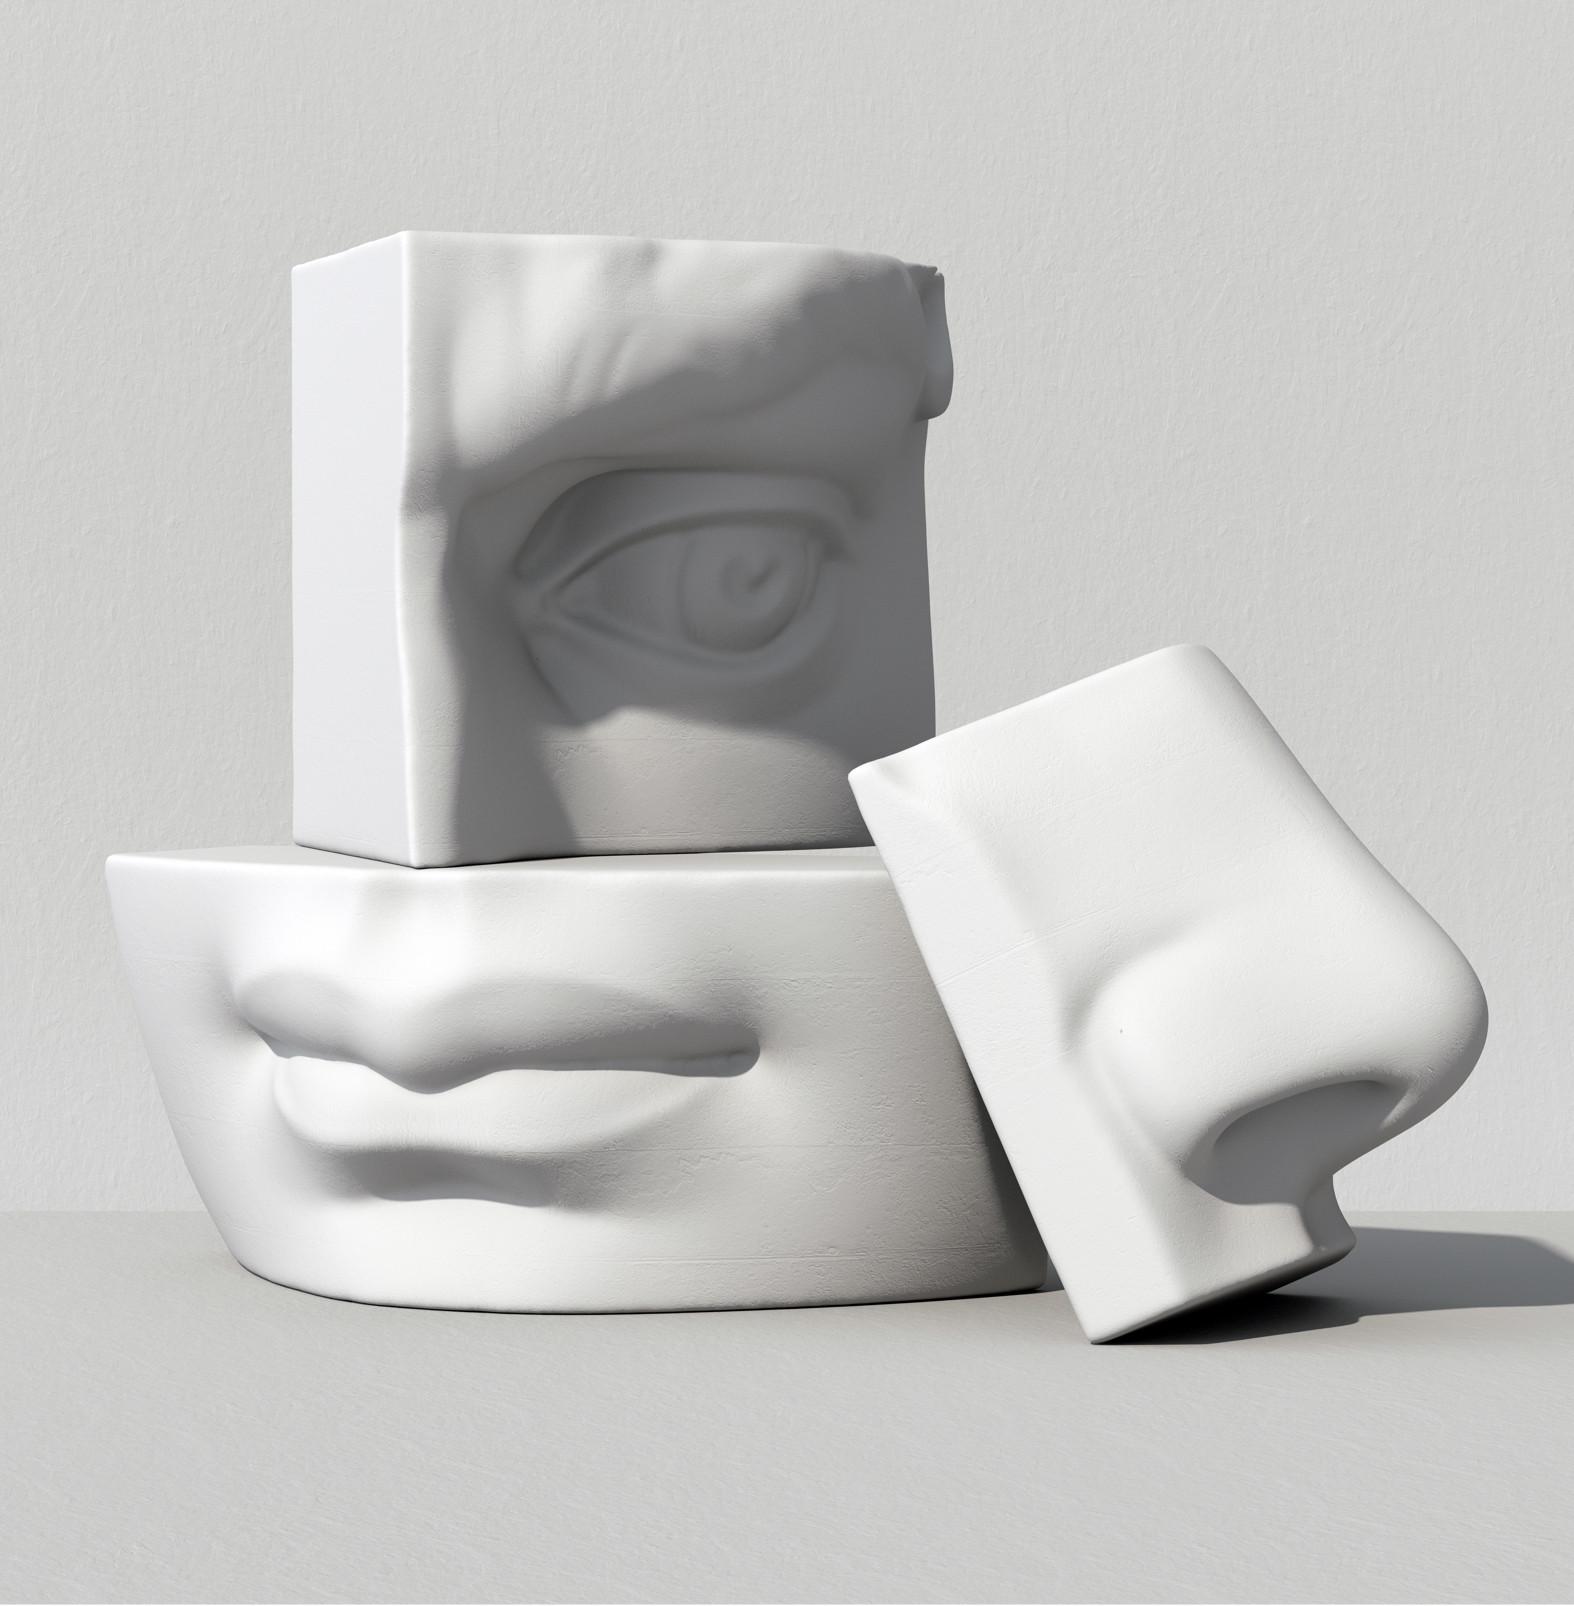 Consulta Medicina estética (facial)